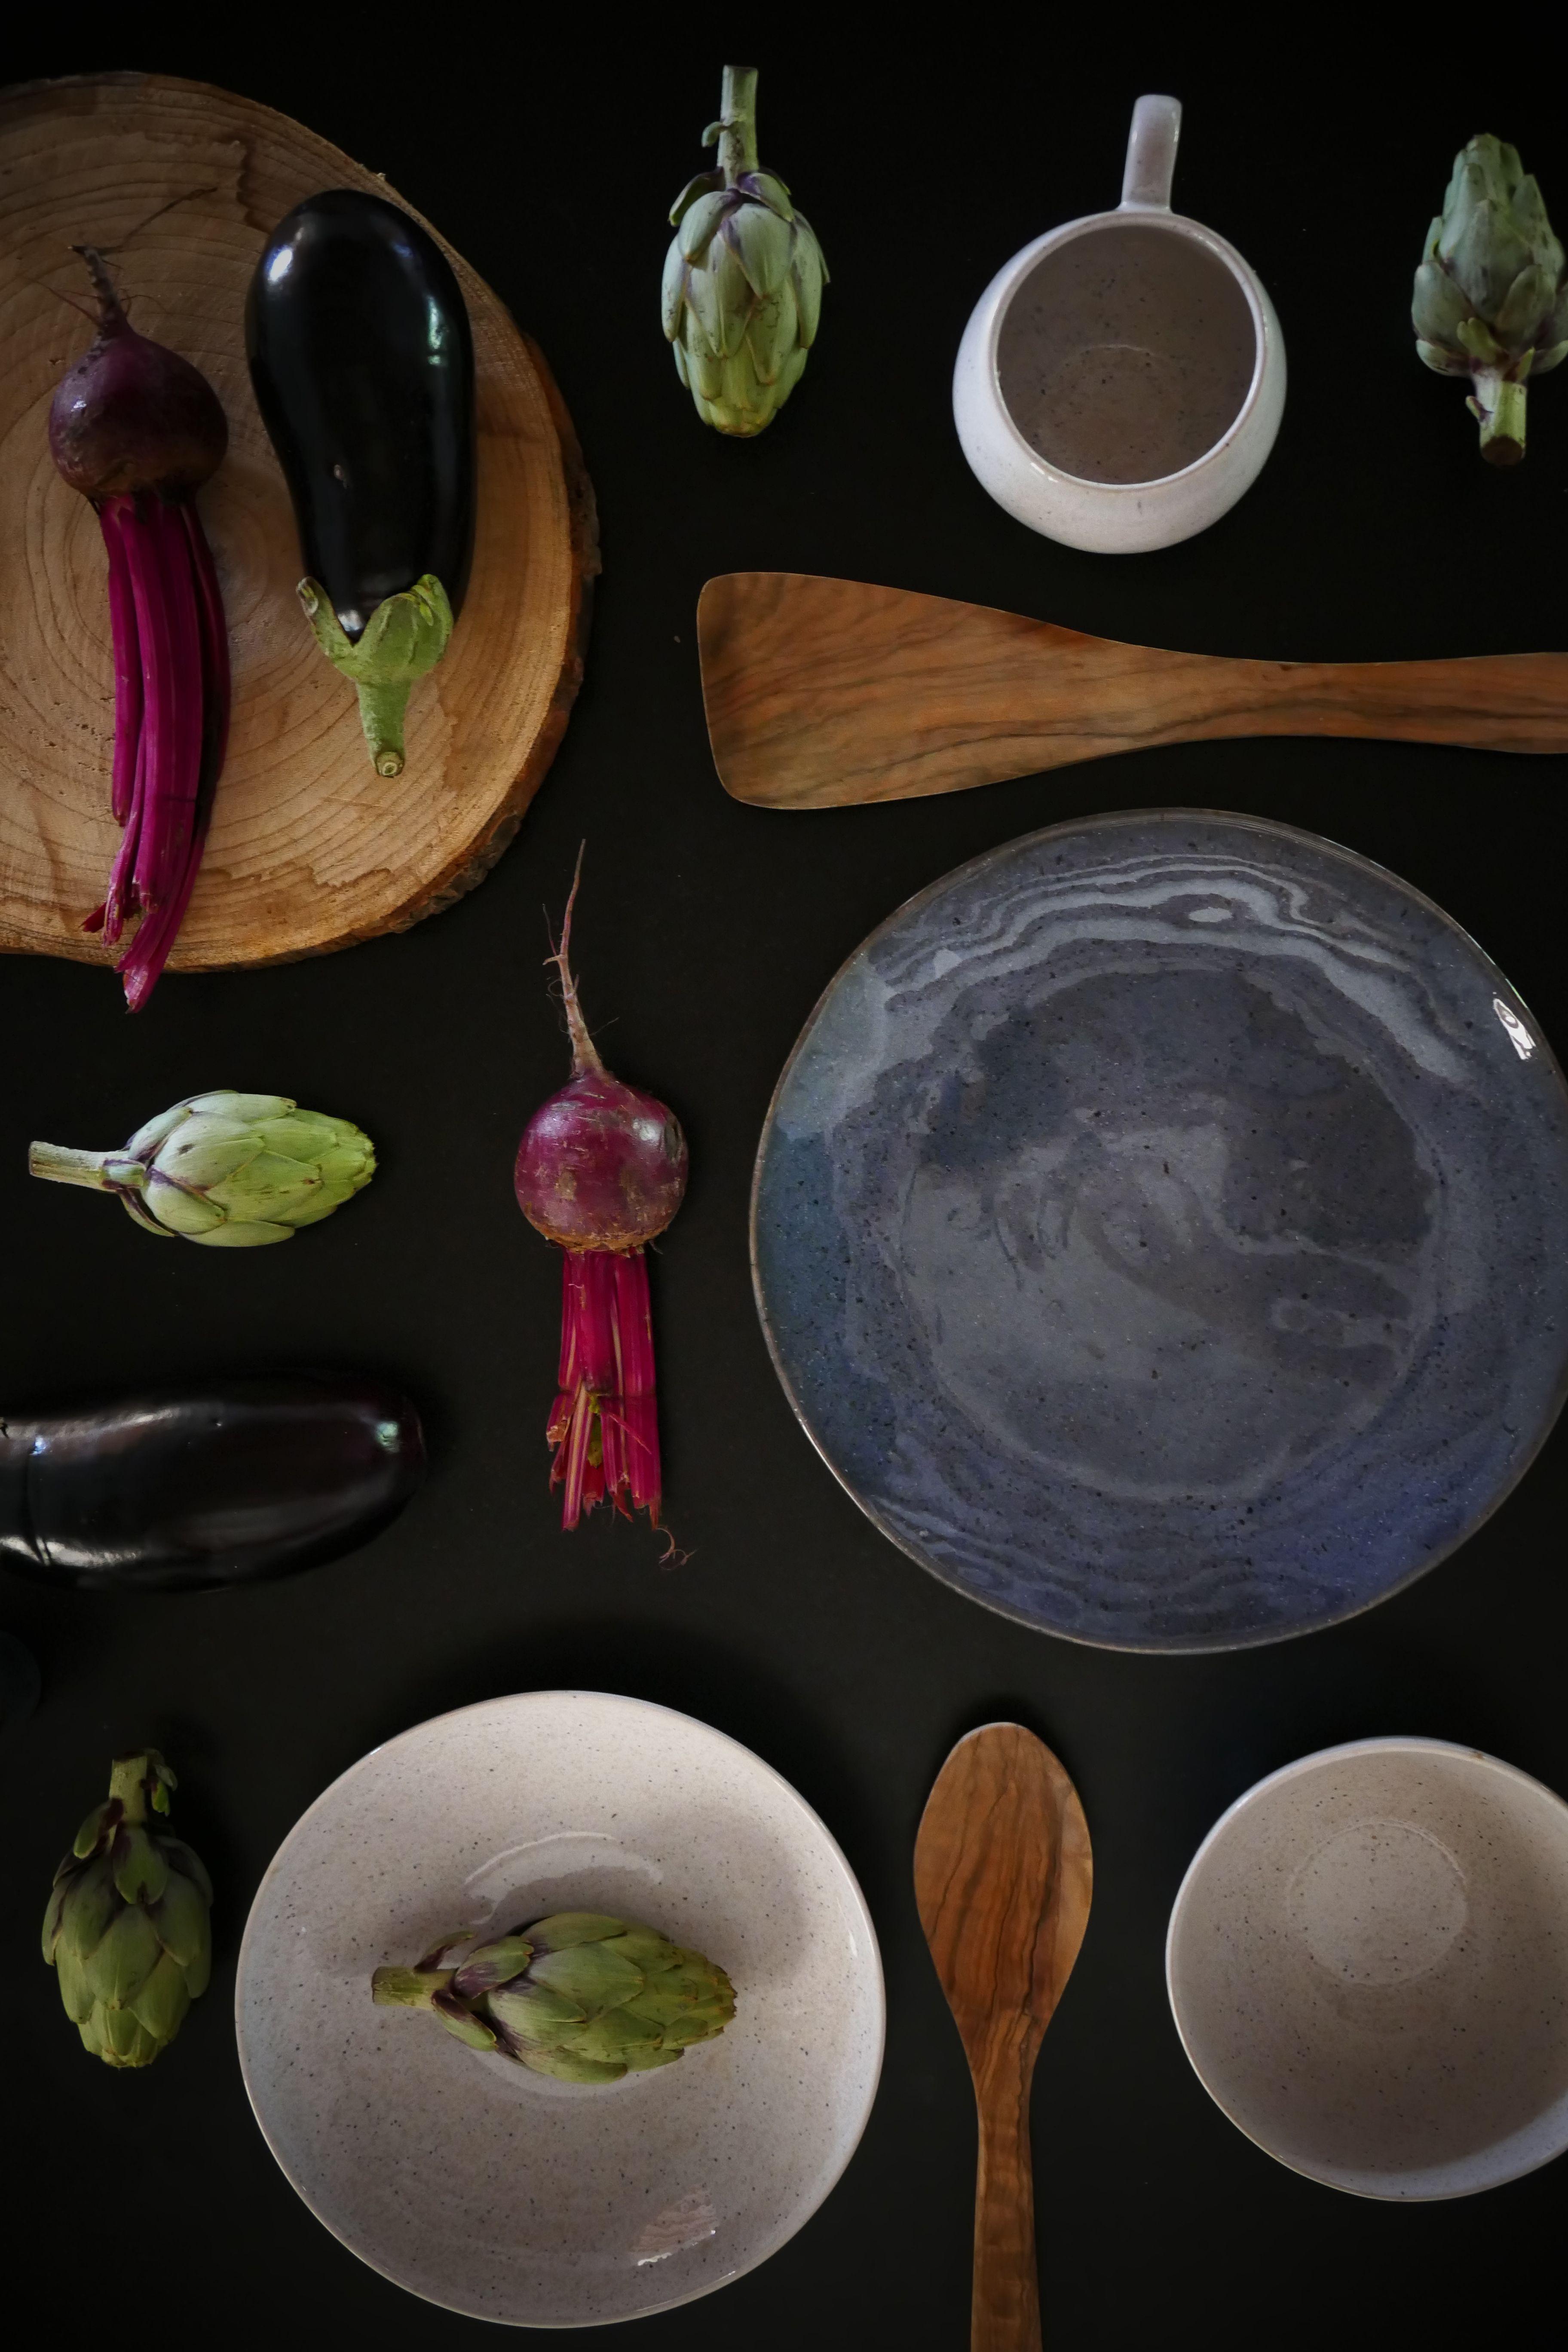 Keramik Geschirr Handgemacht Portugal Pottery Teller Schüsseln Tassen LÓnja Lonjaliving De Gedeckter Tisch Steingut S Plates Pottery Plates Pottery